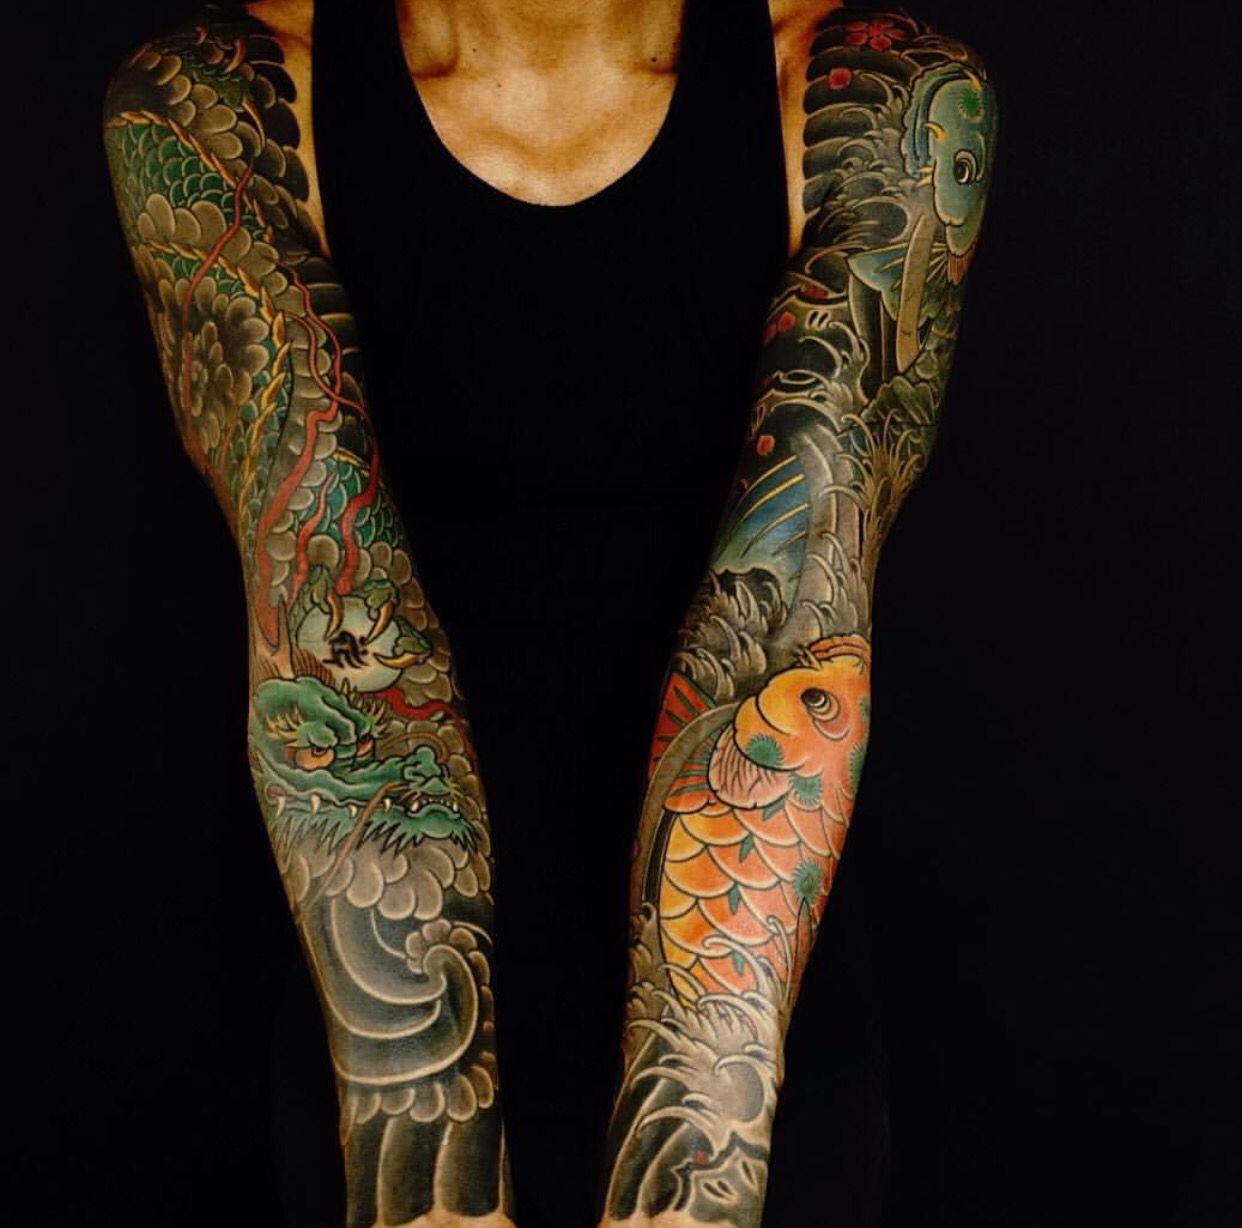 Japanese Koi Dragon And Wind Bars Tattoos Japanese Tattoo Tattoos For Guys